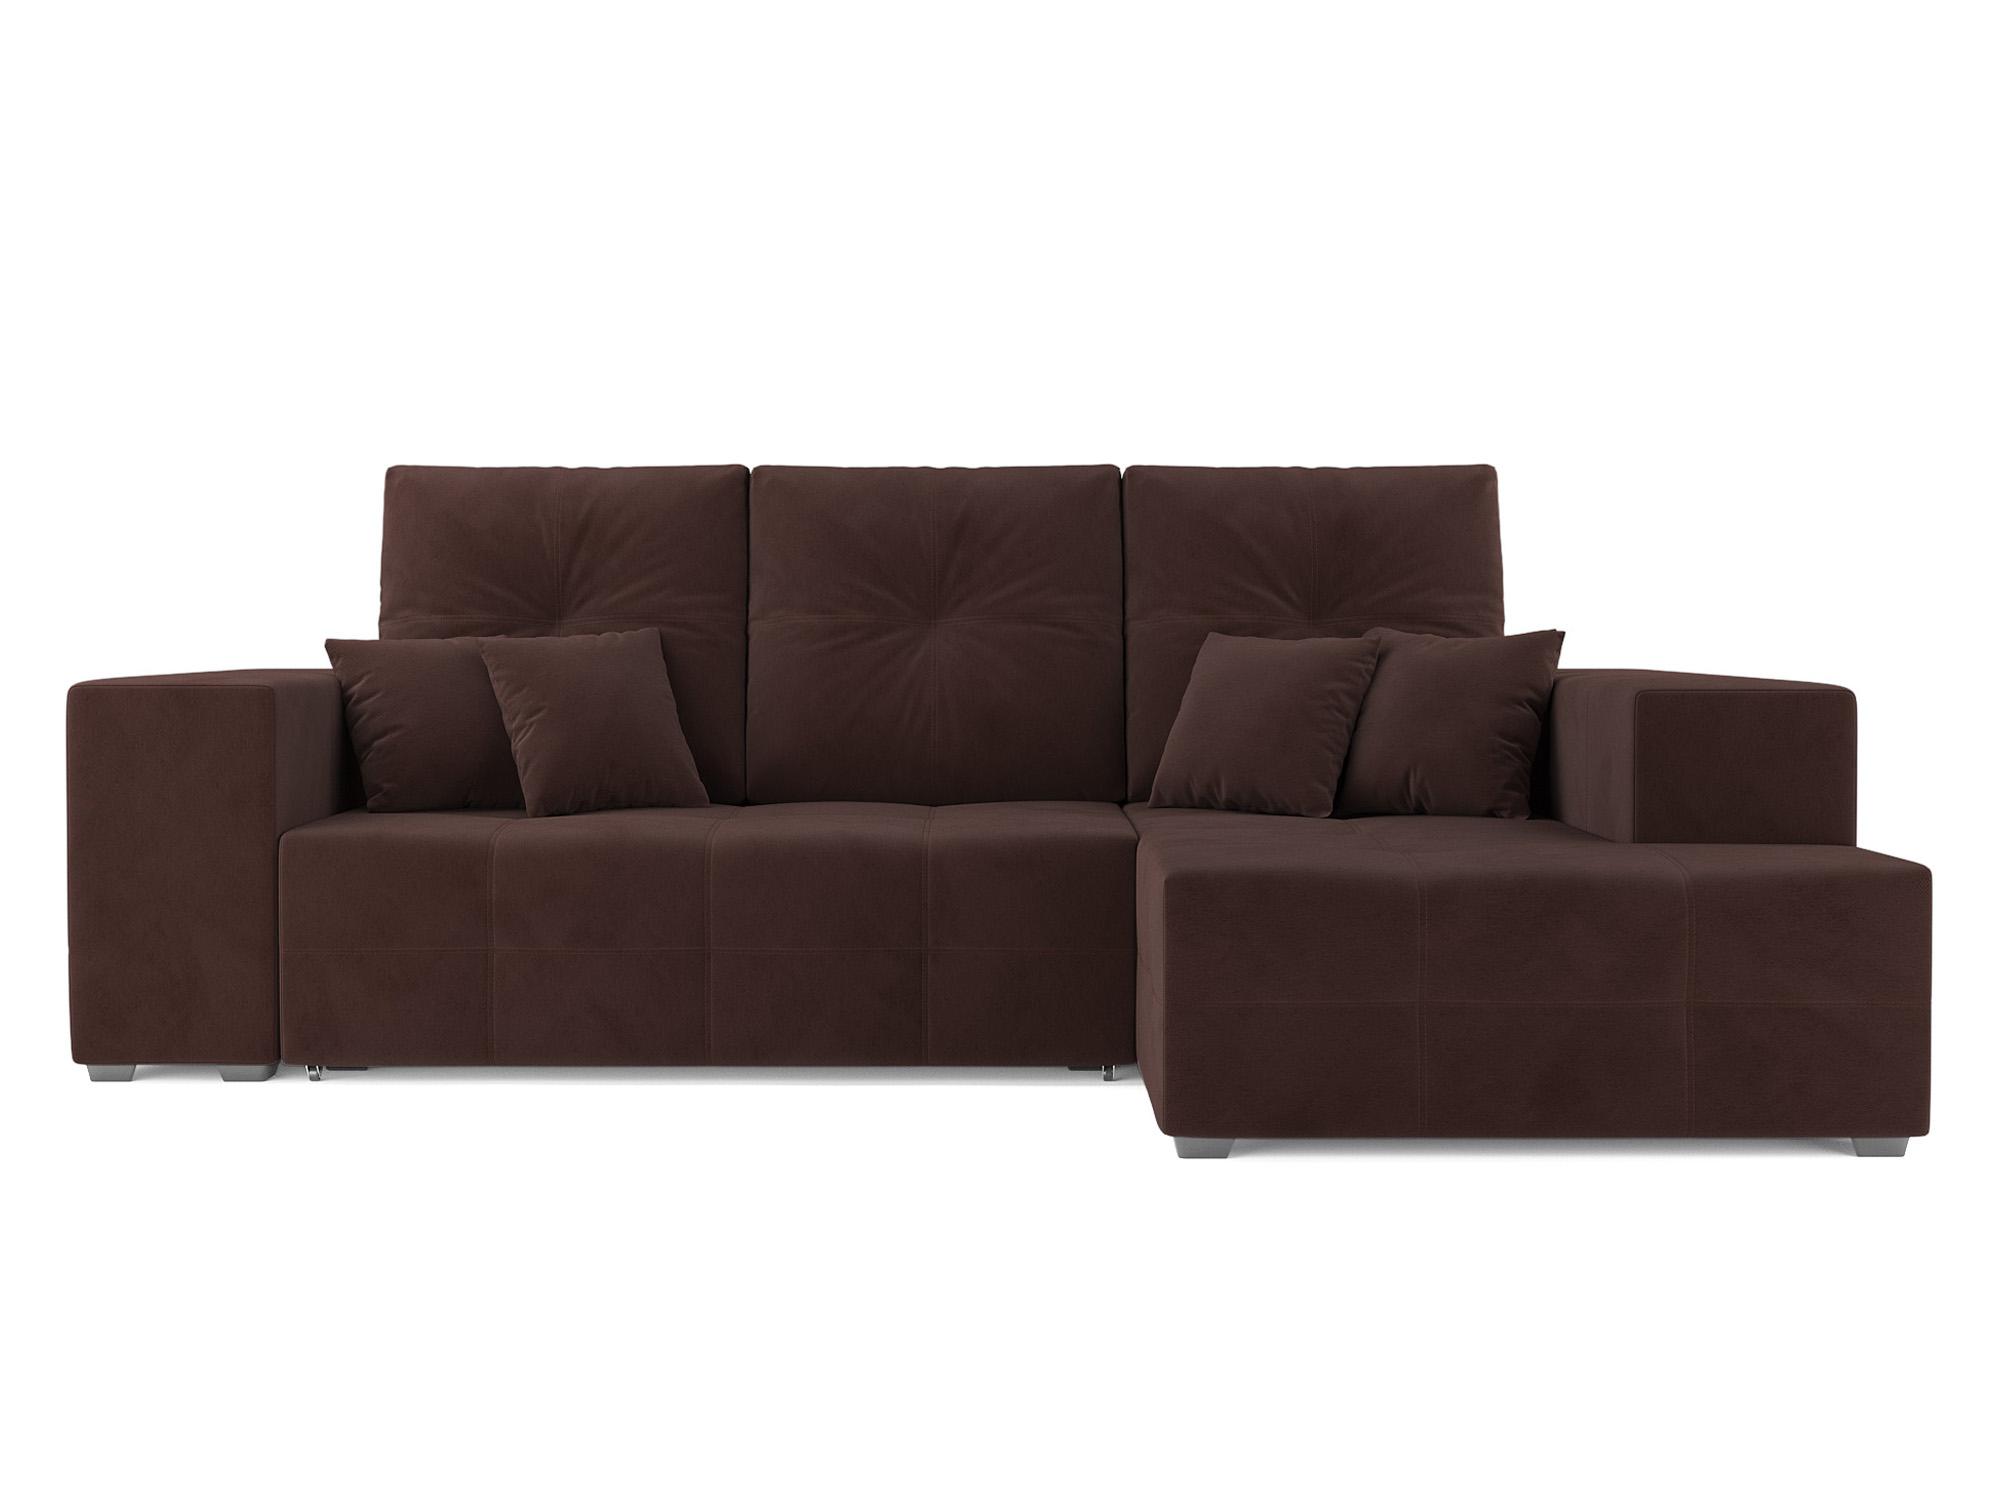 Угловой диван Монреаль Правый угол MebelVia Коричневый темный, Велюр Коричневый темный